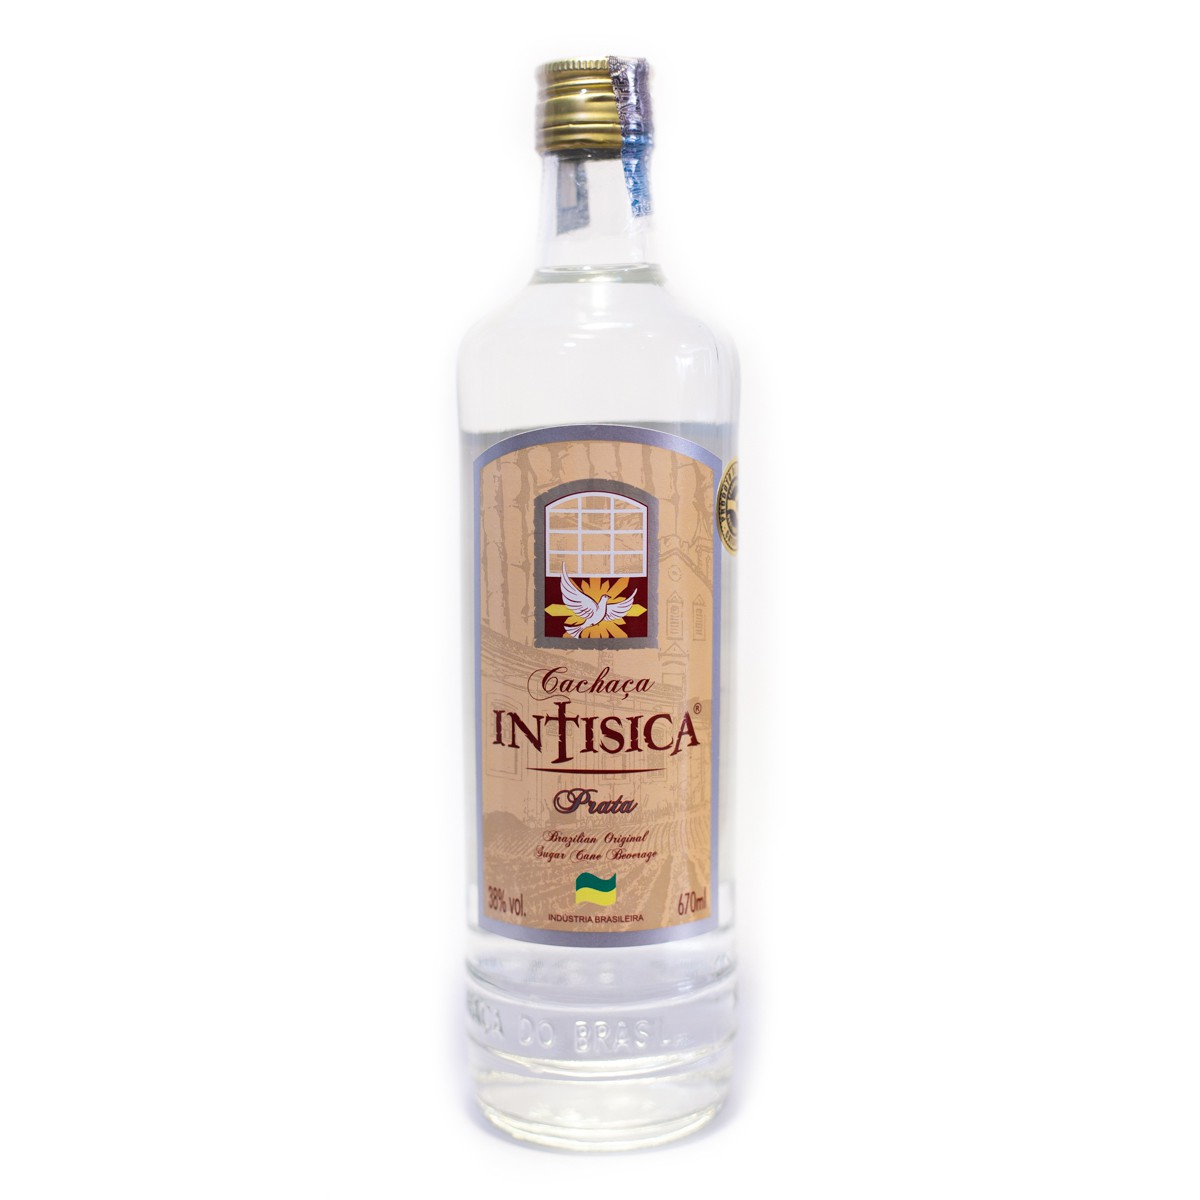 Cachaça Prata Intisica - 670 ml - Barril de Jequetibá